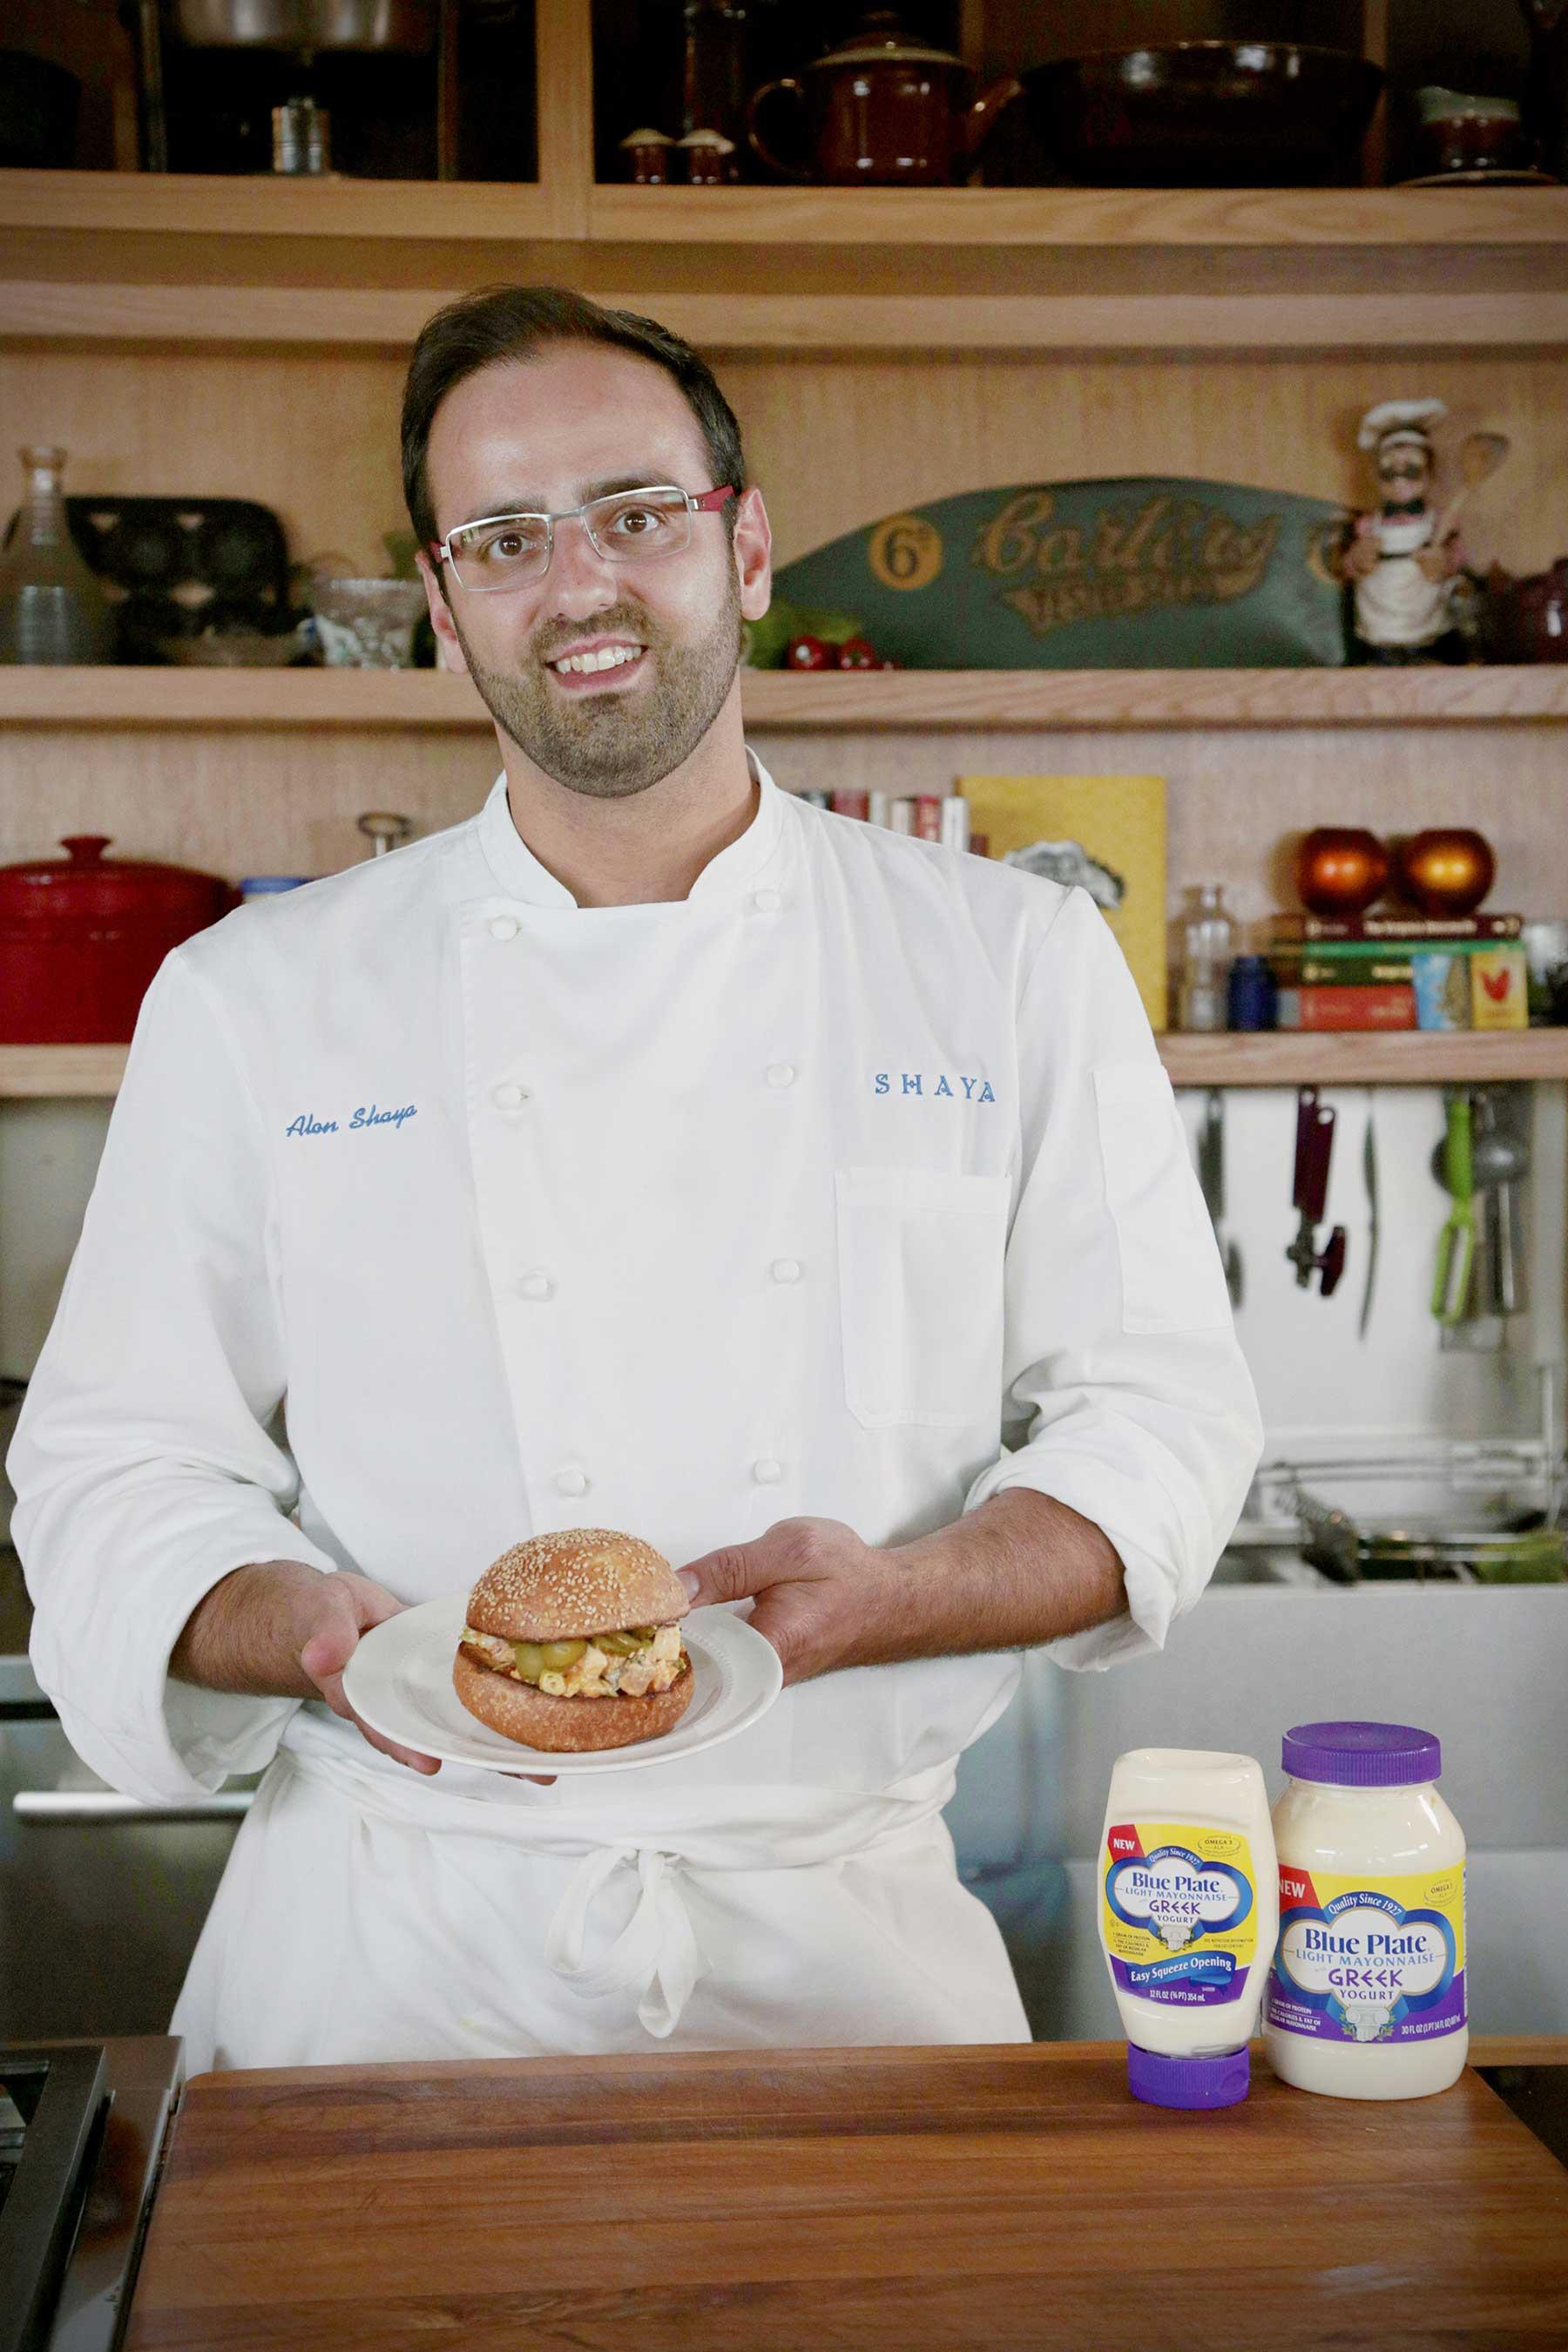 Blue Plate presents an industry first: Light Mayonnaise with Greek Yogurt. James Beard Award winner Chef Alon Shaya features it in three recipes.